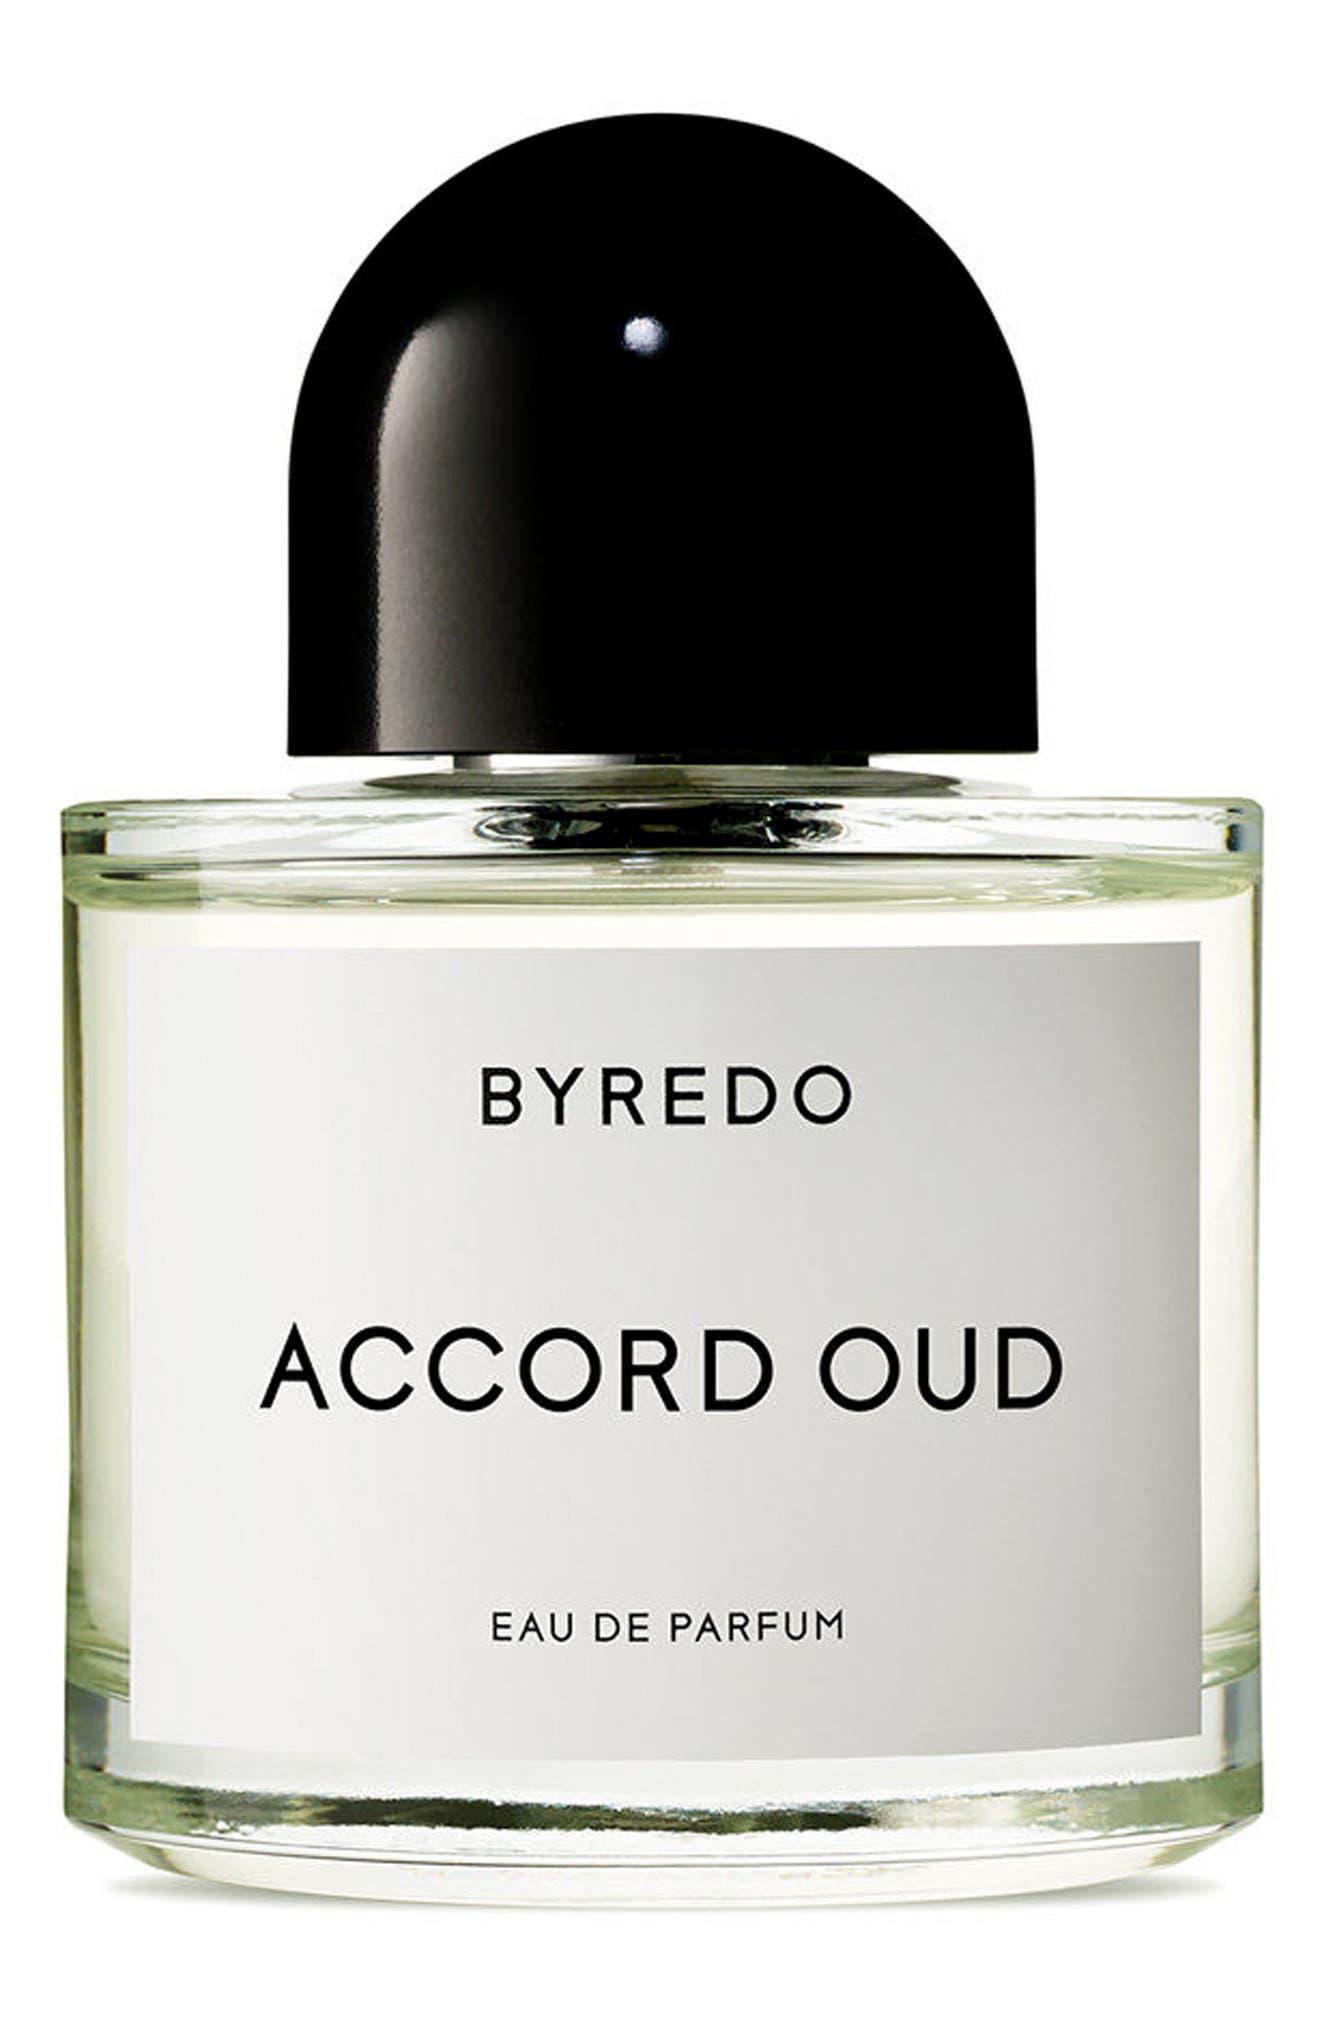 Byredo Accord Oud Eau De Parfum